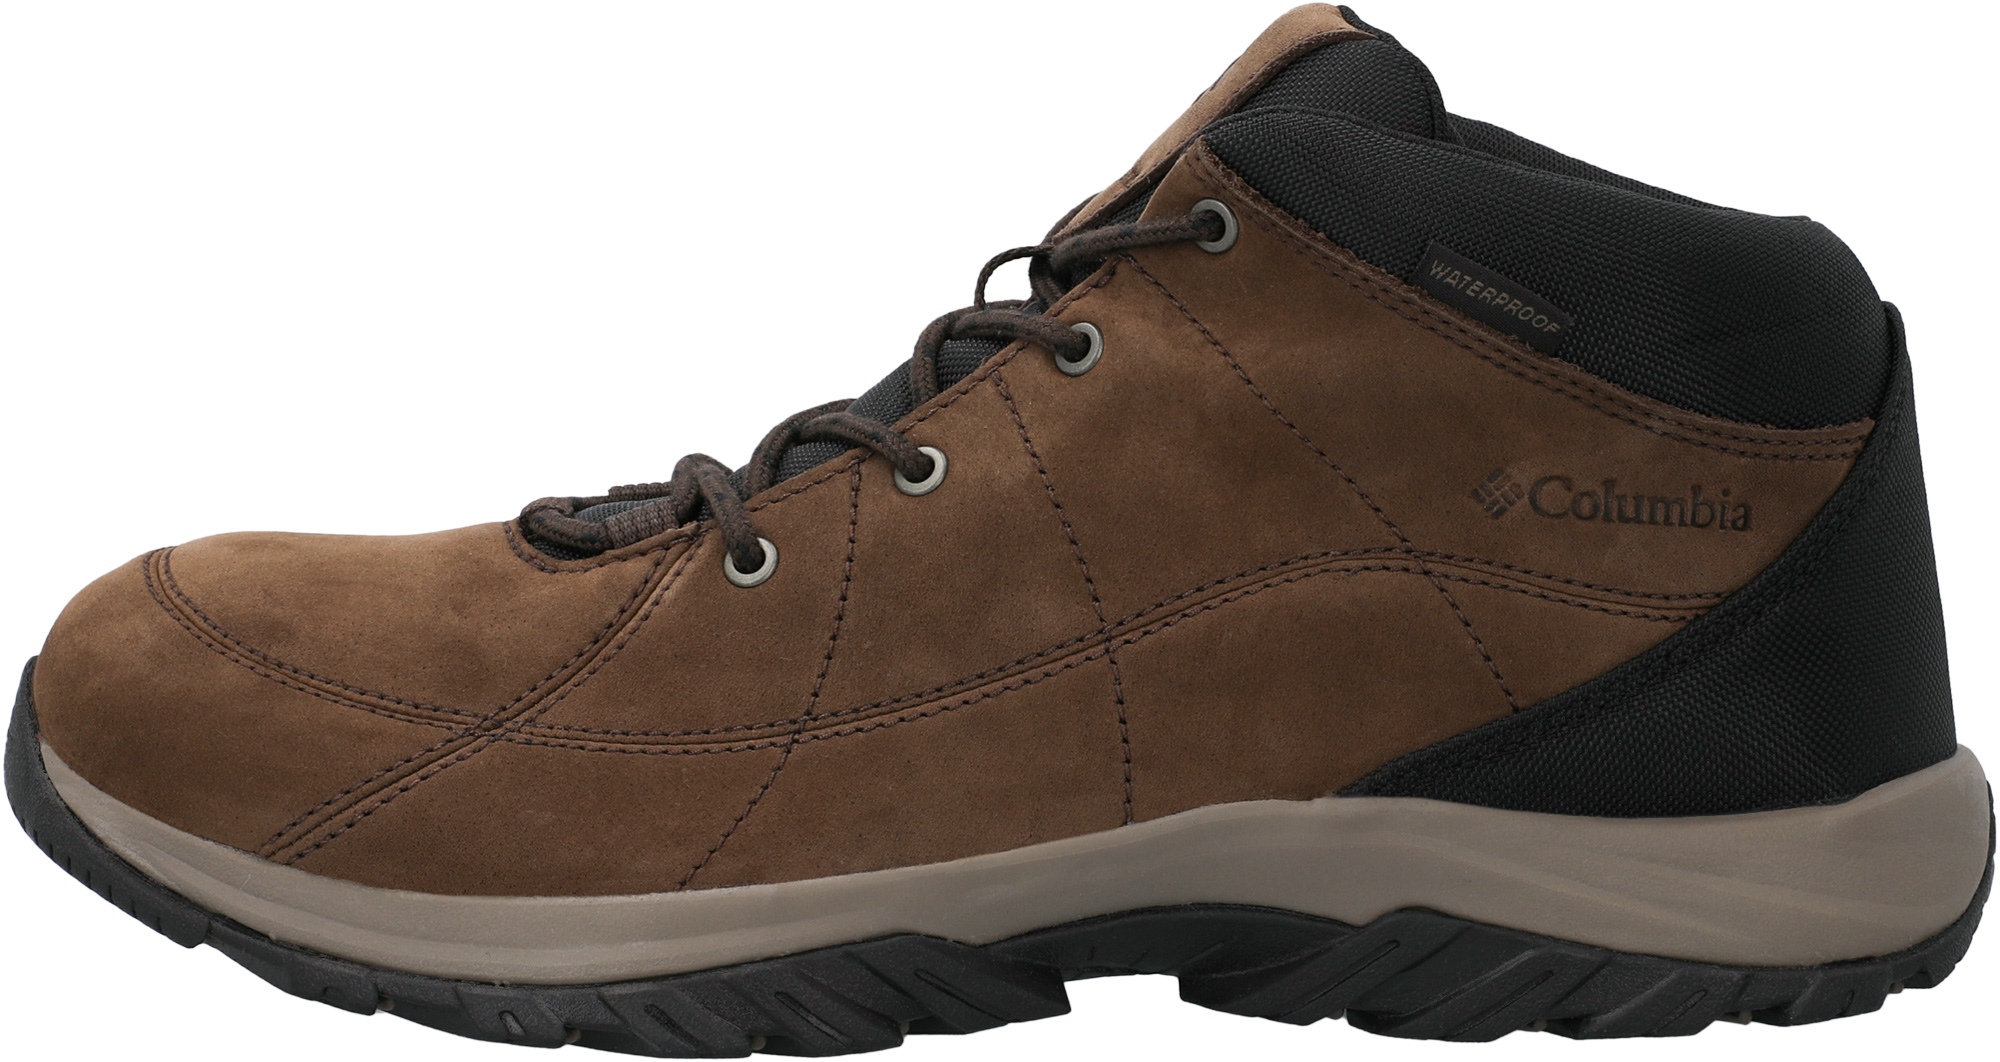 Ботинки мужские Columbia Crestwood™ Venture Mid Waterproof, размер 44